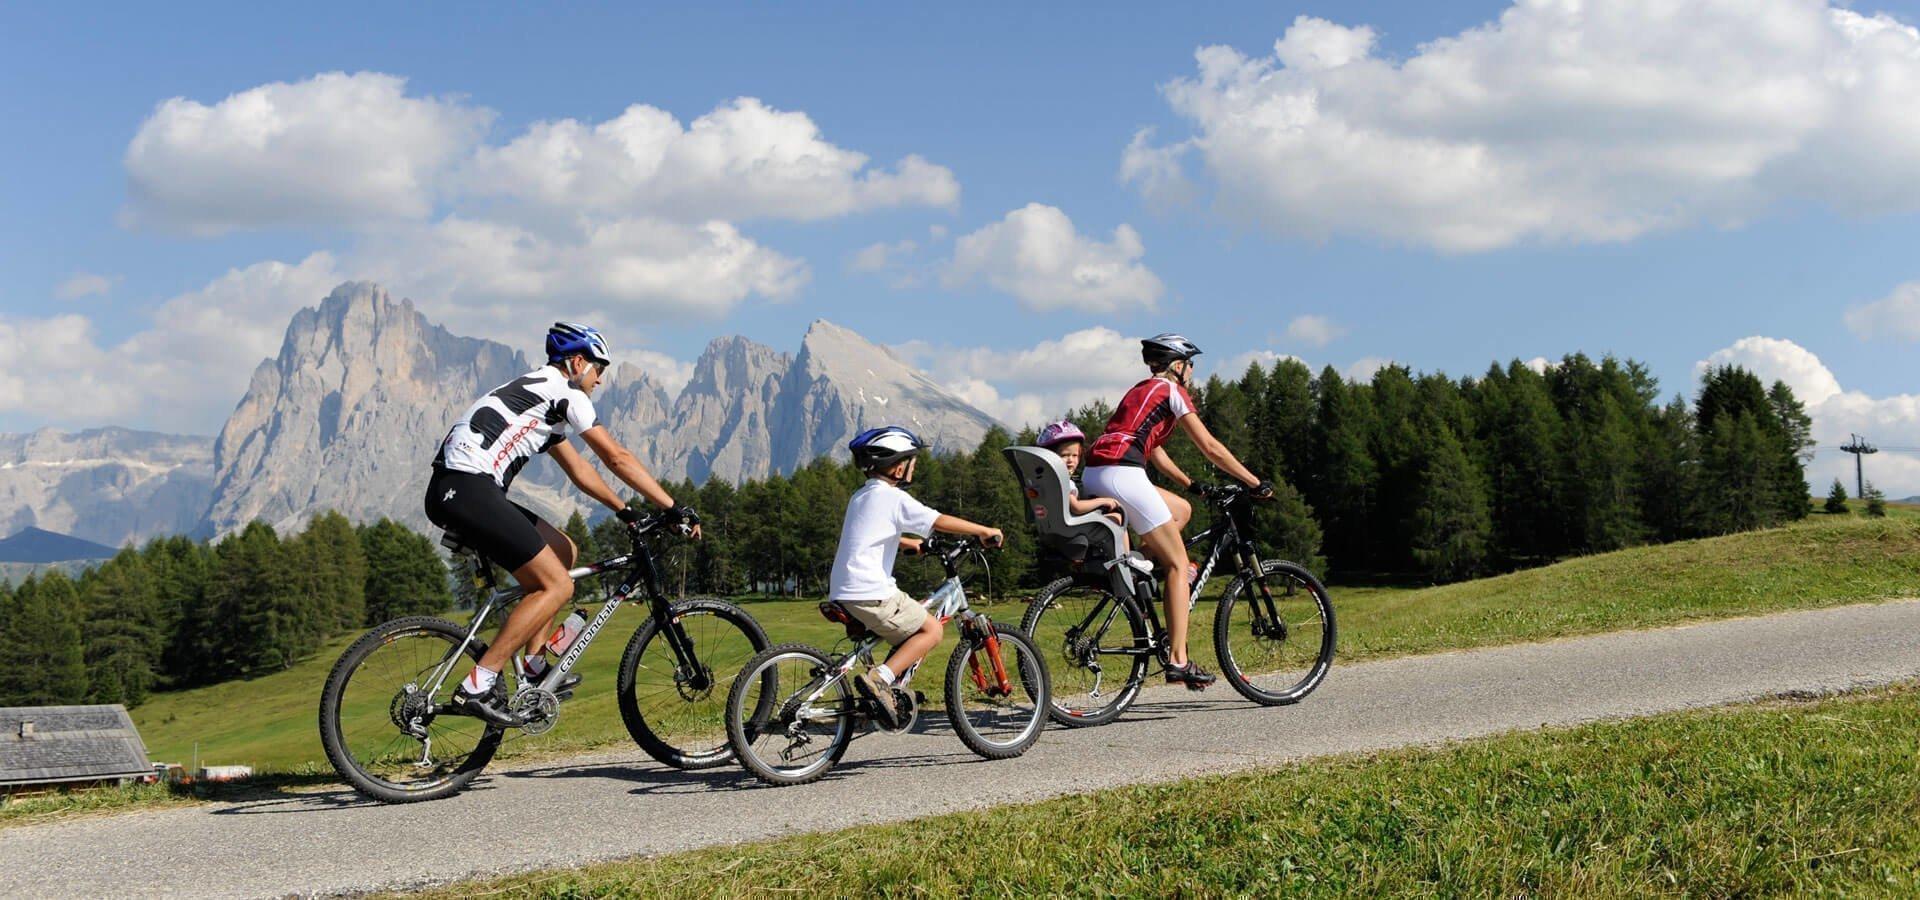 mountainbike-urlaub-seiser-alm